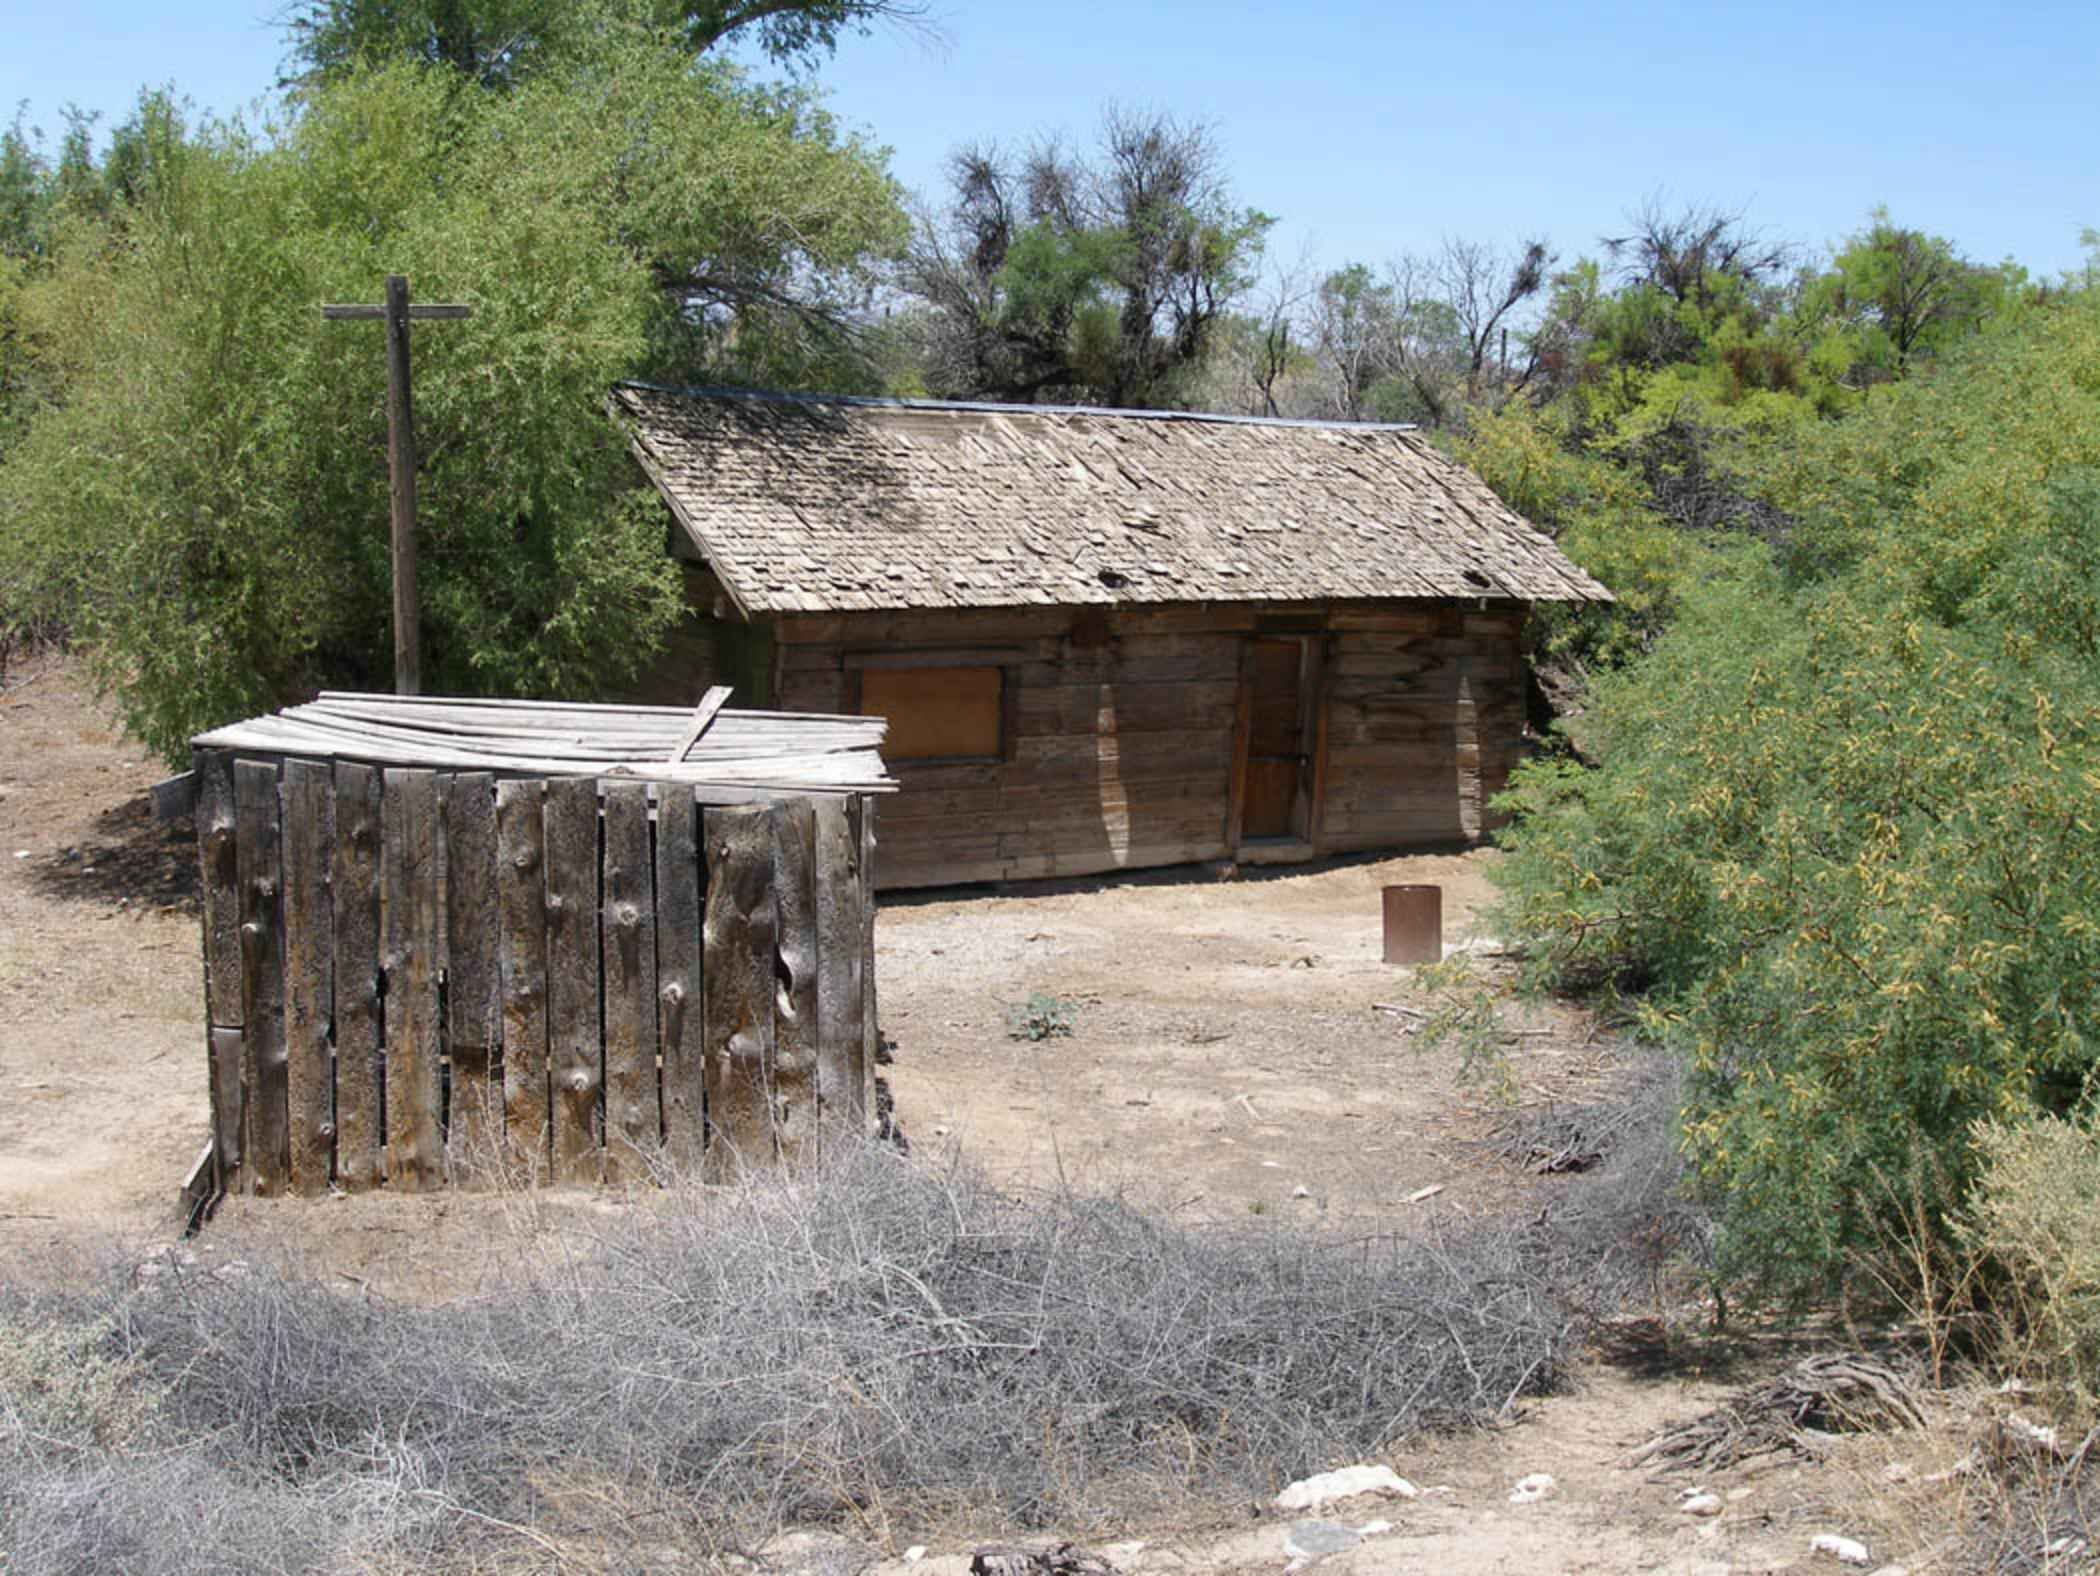 File Historic Blacksmith Shop And Railroad Tie House Jpg